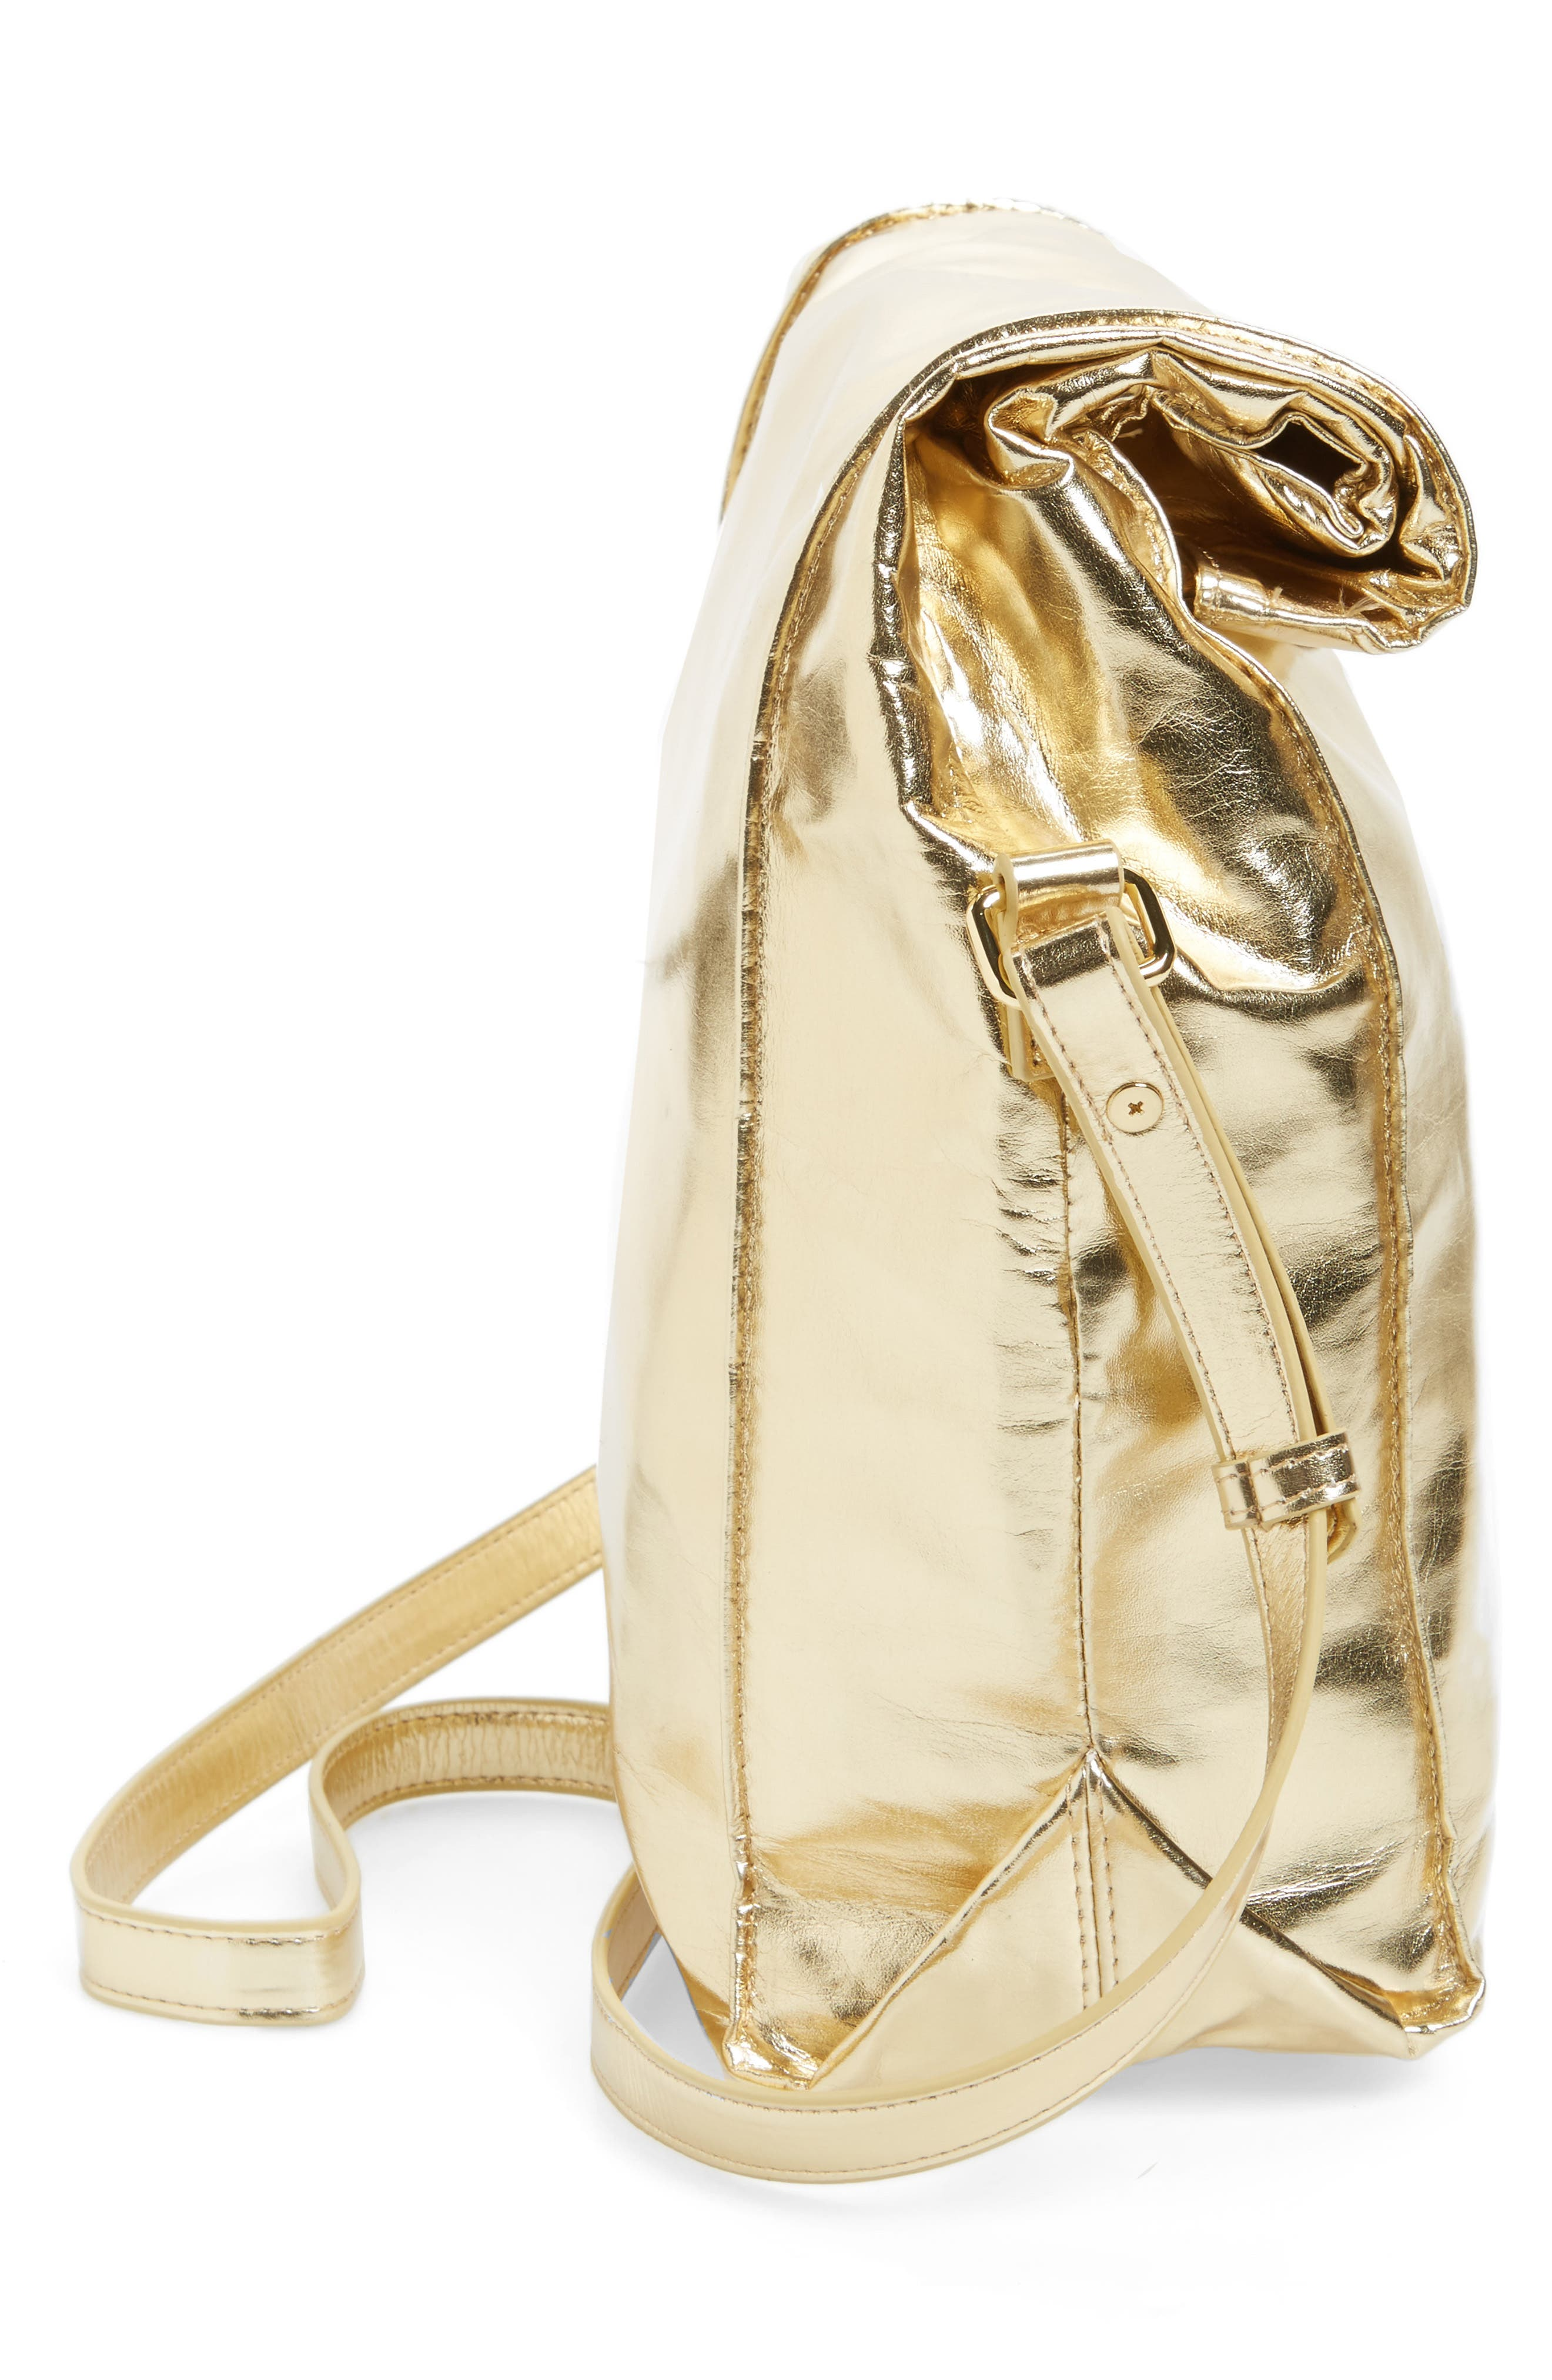 Crossbody Lunch Bag,                             Alternate thumbnail 5, color,                             Metallic Gold